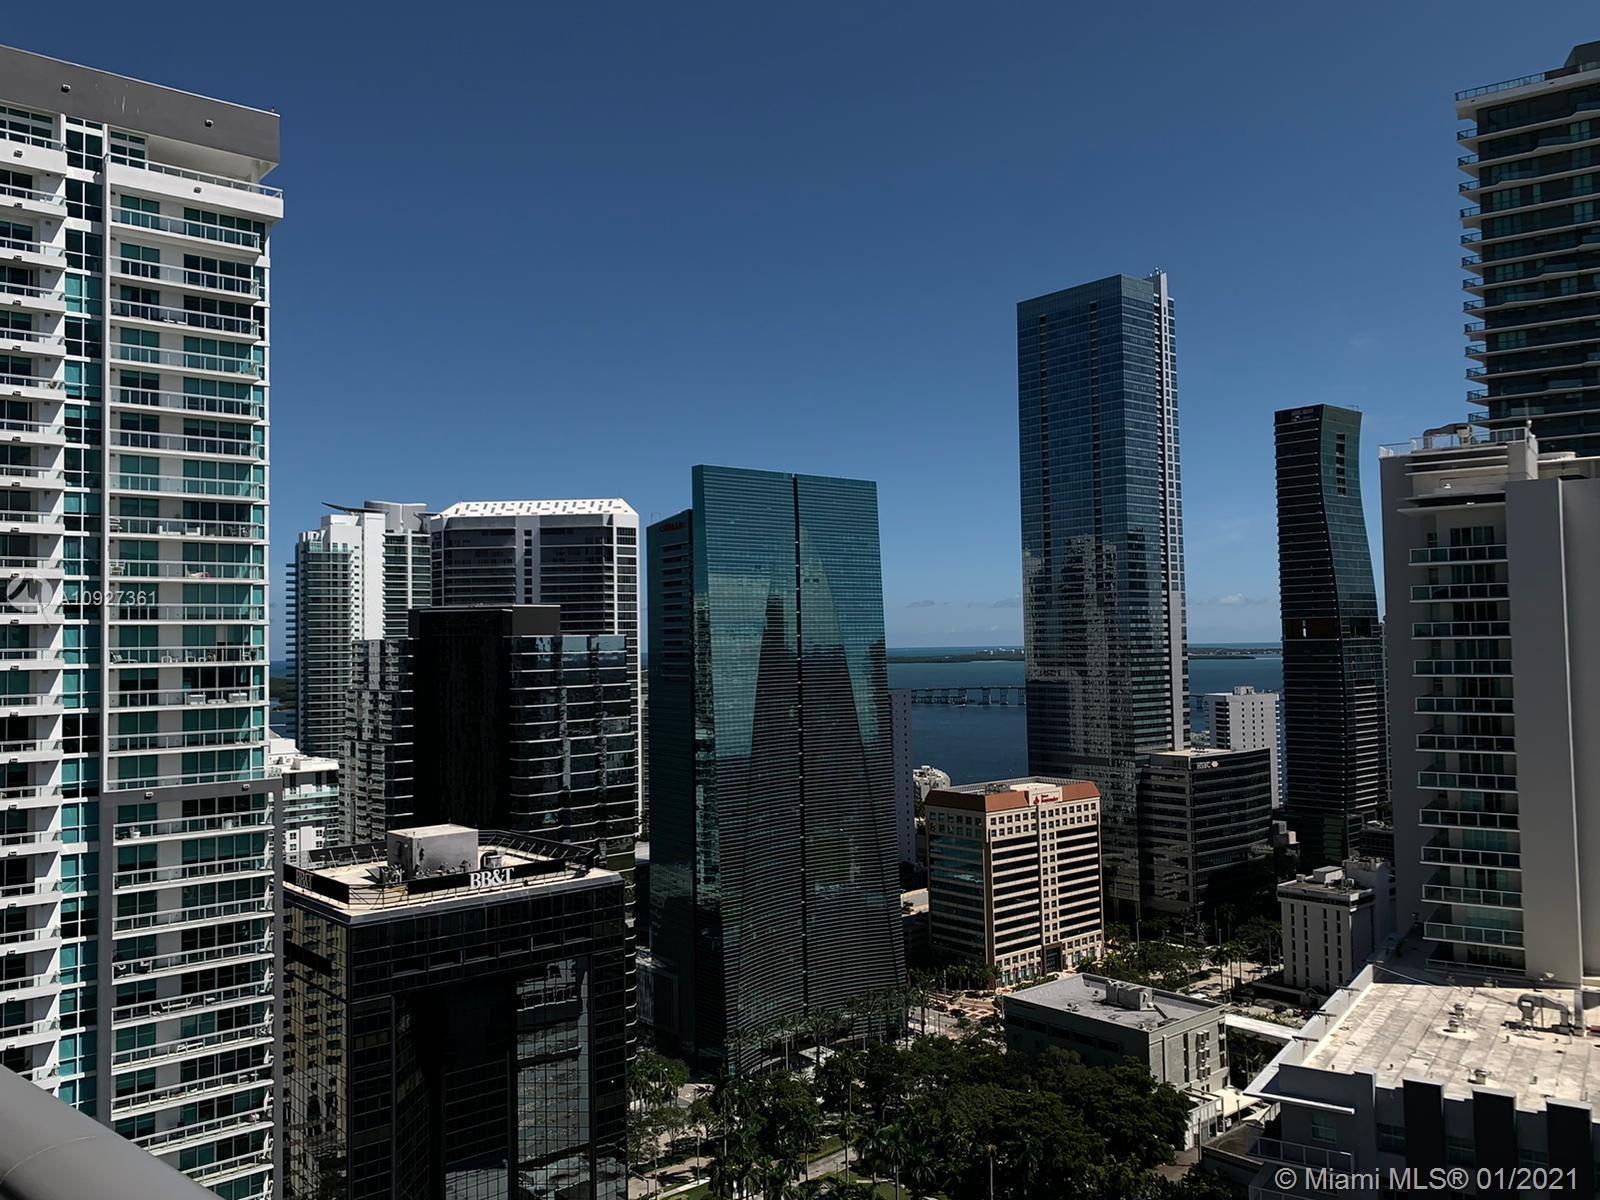 1100 Millecento #3304 - 1100 S Miami Ave #3304, Miami, FL 33130